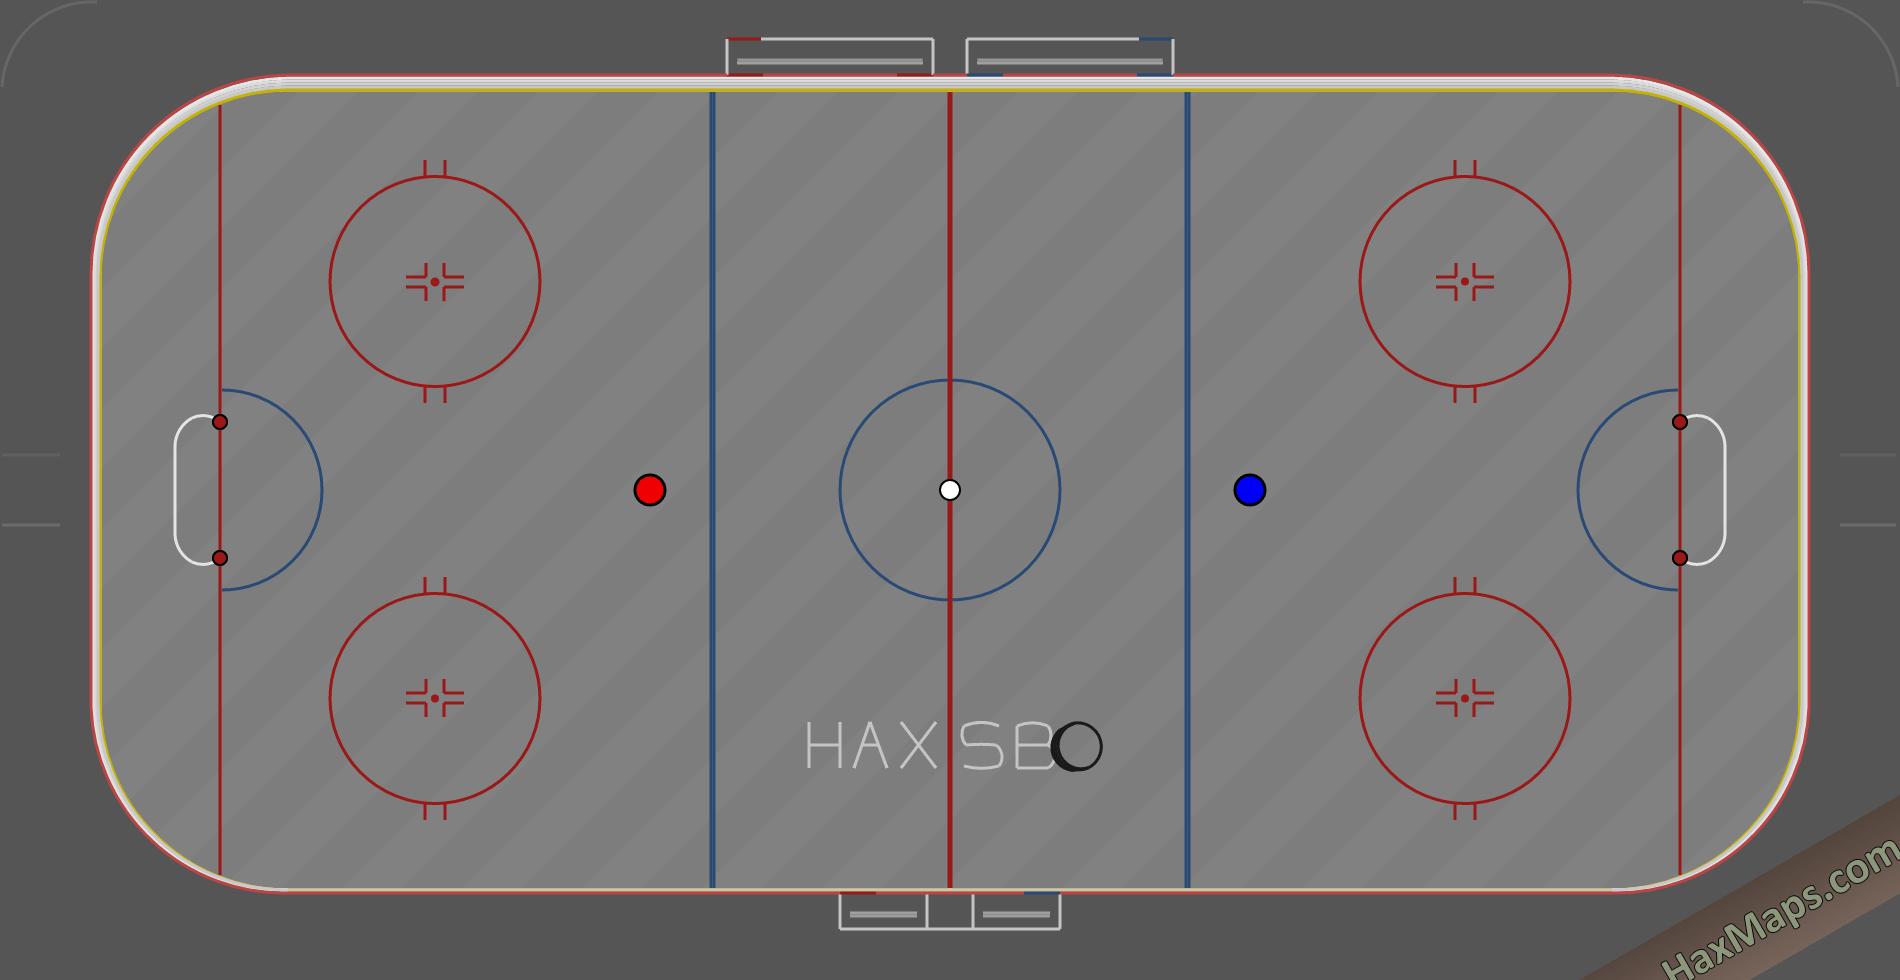 hax ball maps | Spacebounce Hockey NHL HaxSB v2